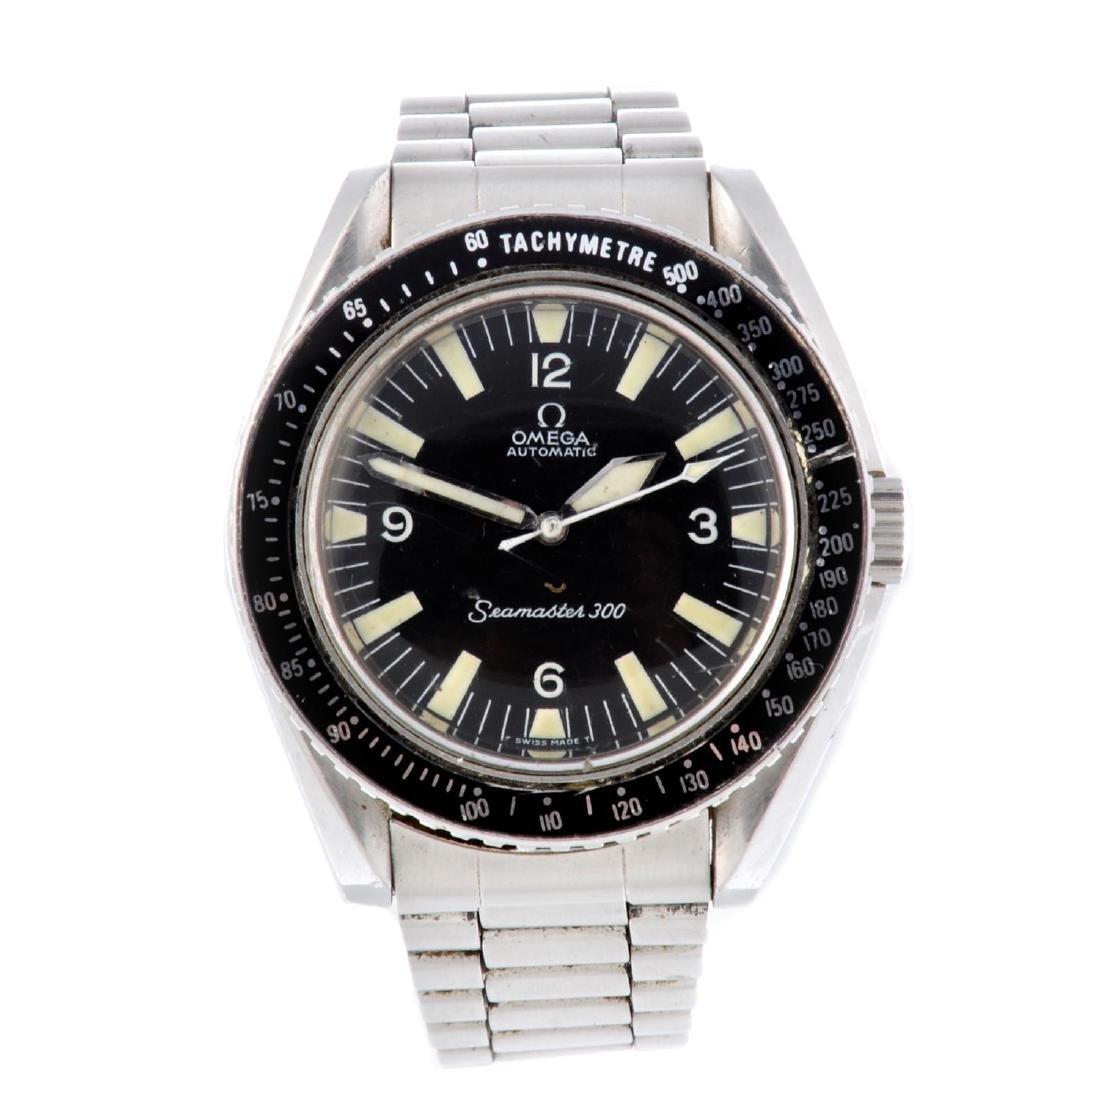 OMEGA - a gentleman's Seamaster 300 bracelet watch.